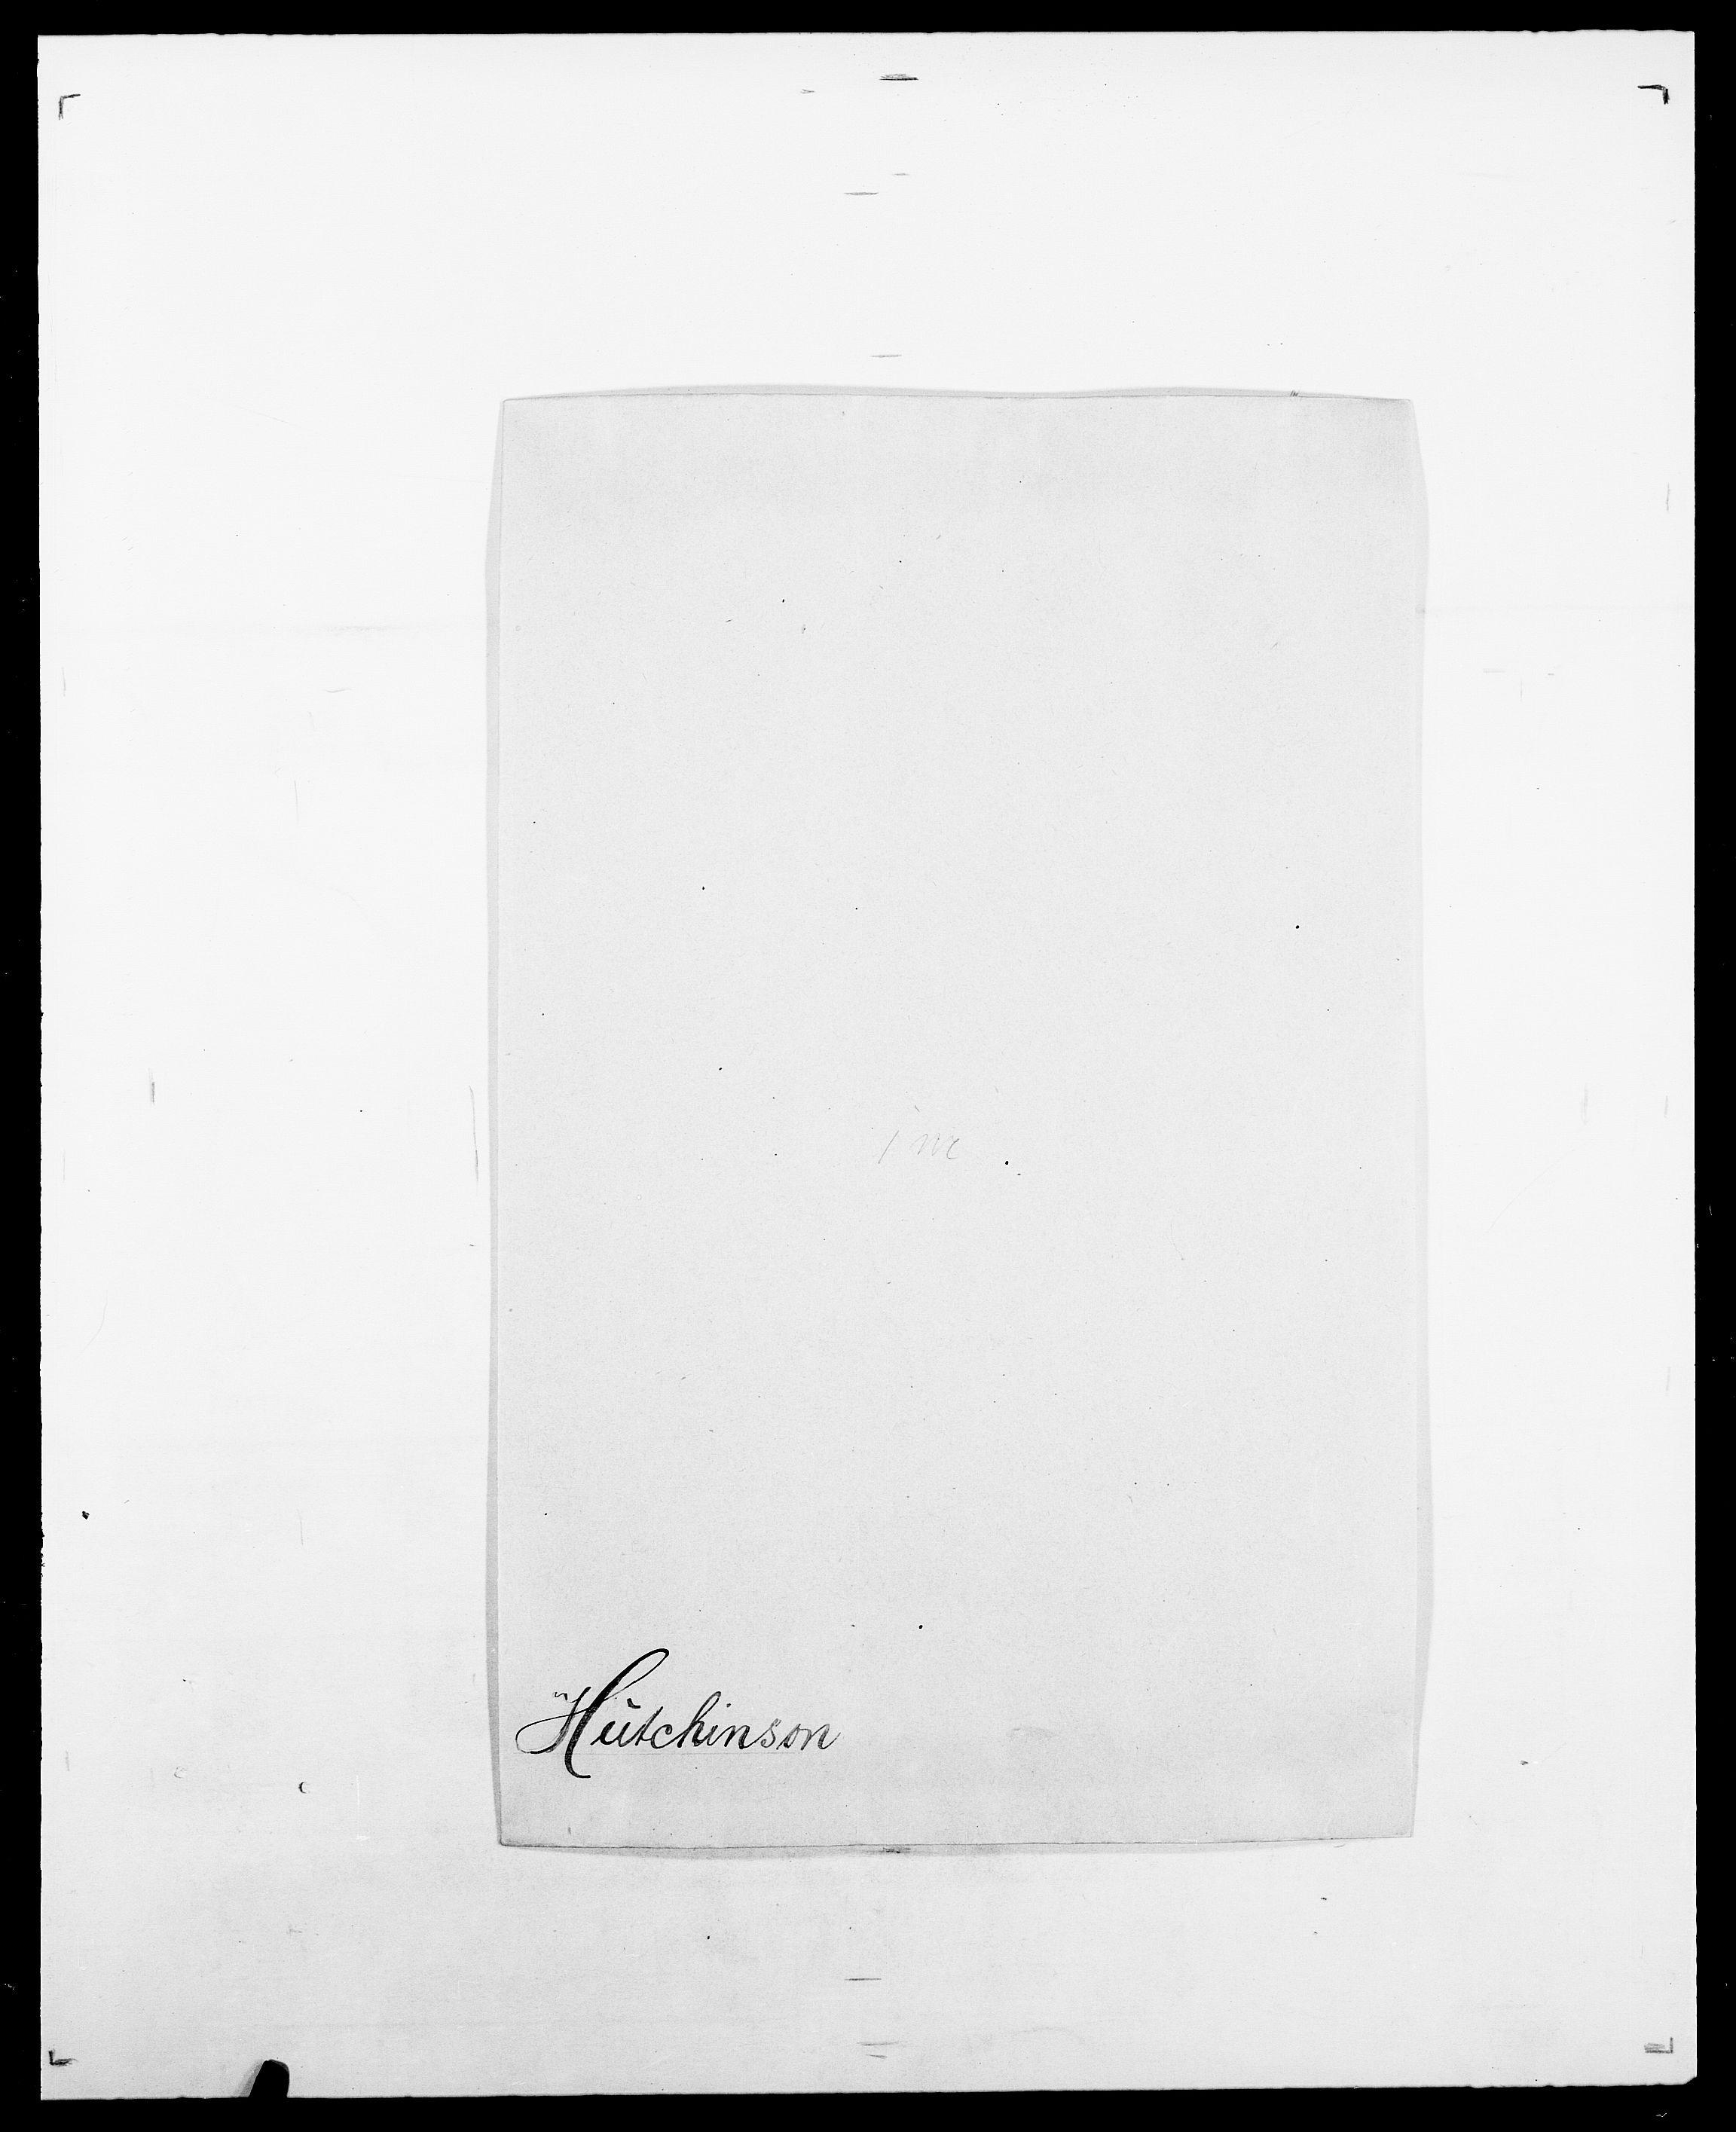 SAO, Delgobe, Charles Antoine - samling, D/Da/L0019: van der Hude - Joys, s. 91